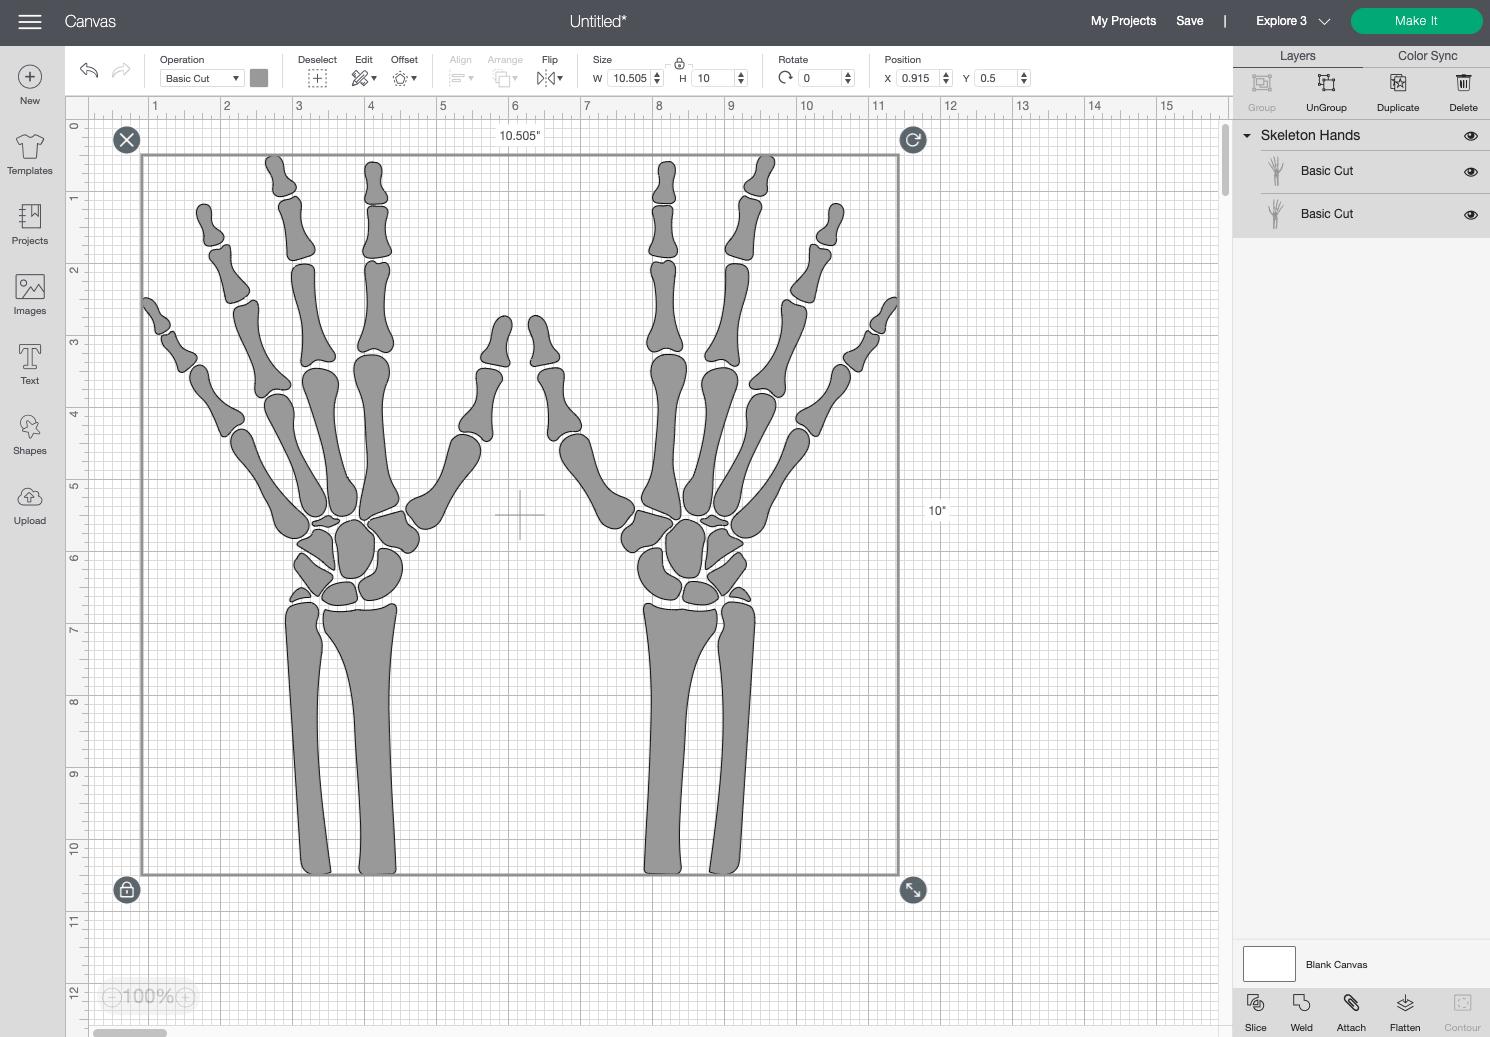 Cricut Design Space: Skeleton hands resized on Canvas